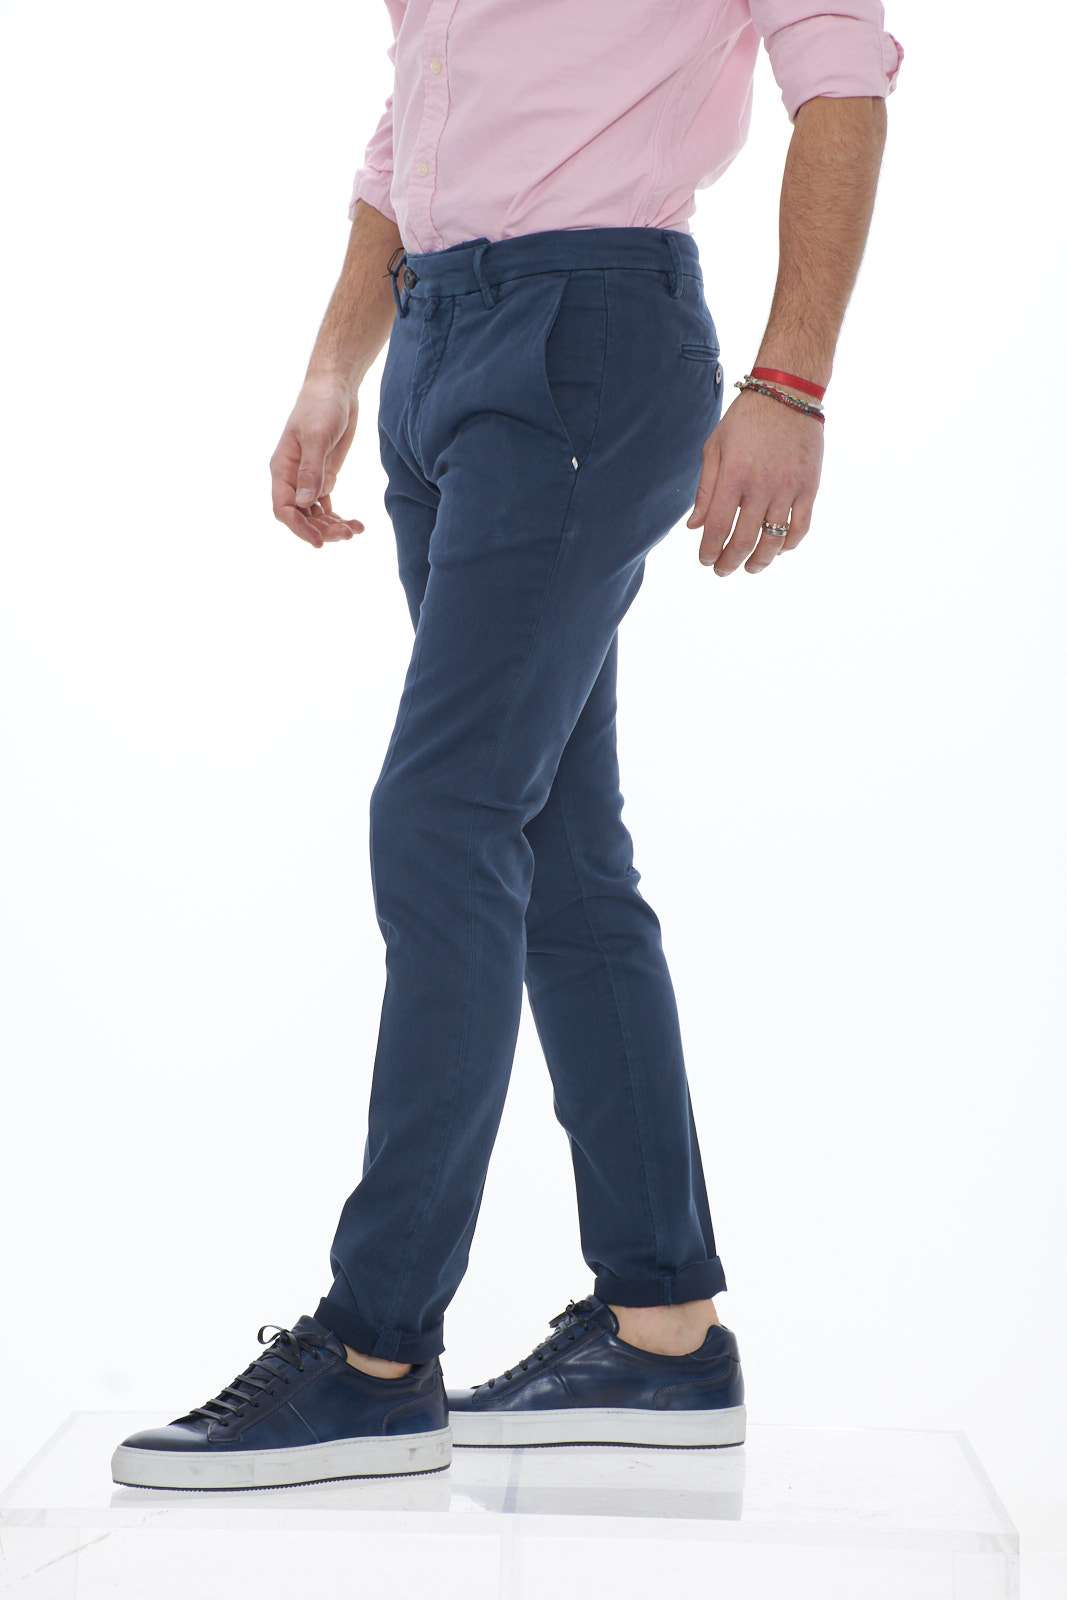 https://www.parmax.com/media/catalog/product/a/i/PE-outlet_parmax-pantalonoe-uomo-Michael-Coal-RICKY3360L-B.jpg